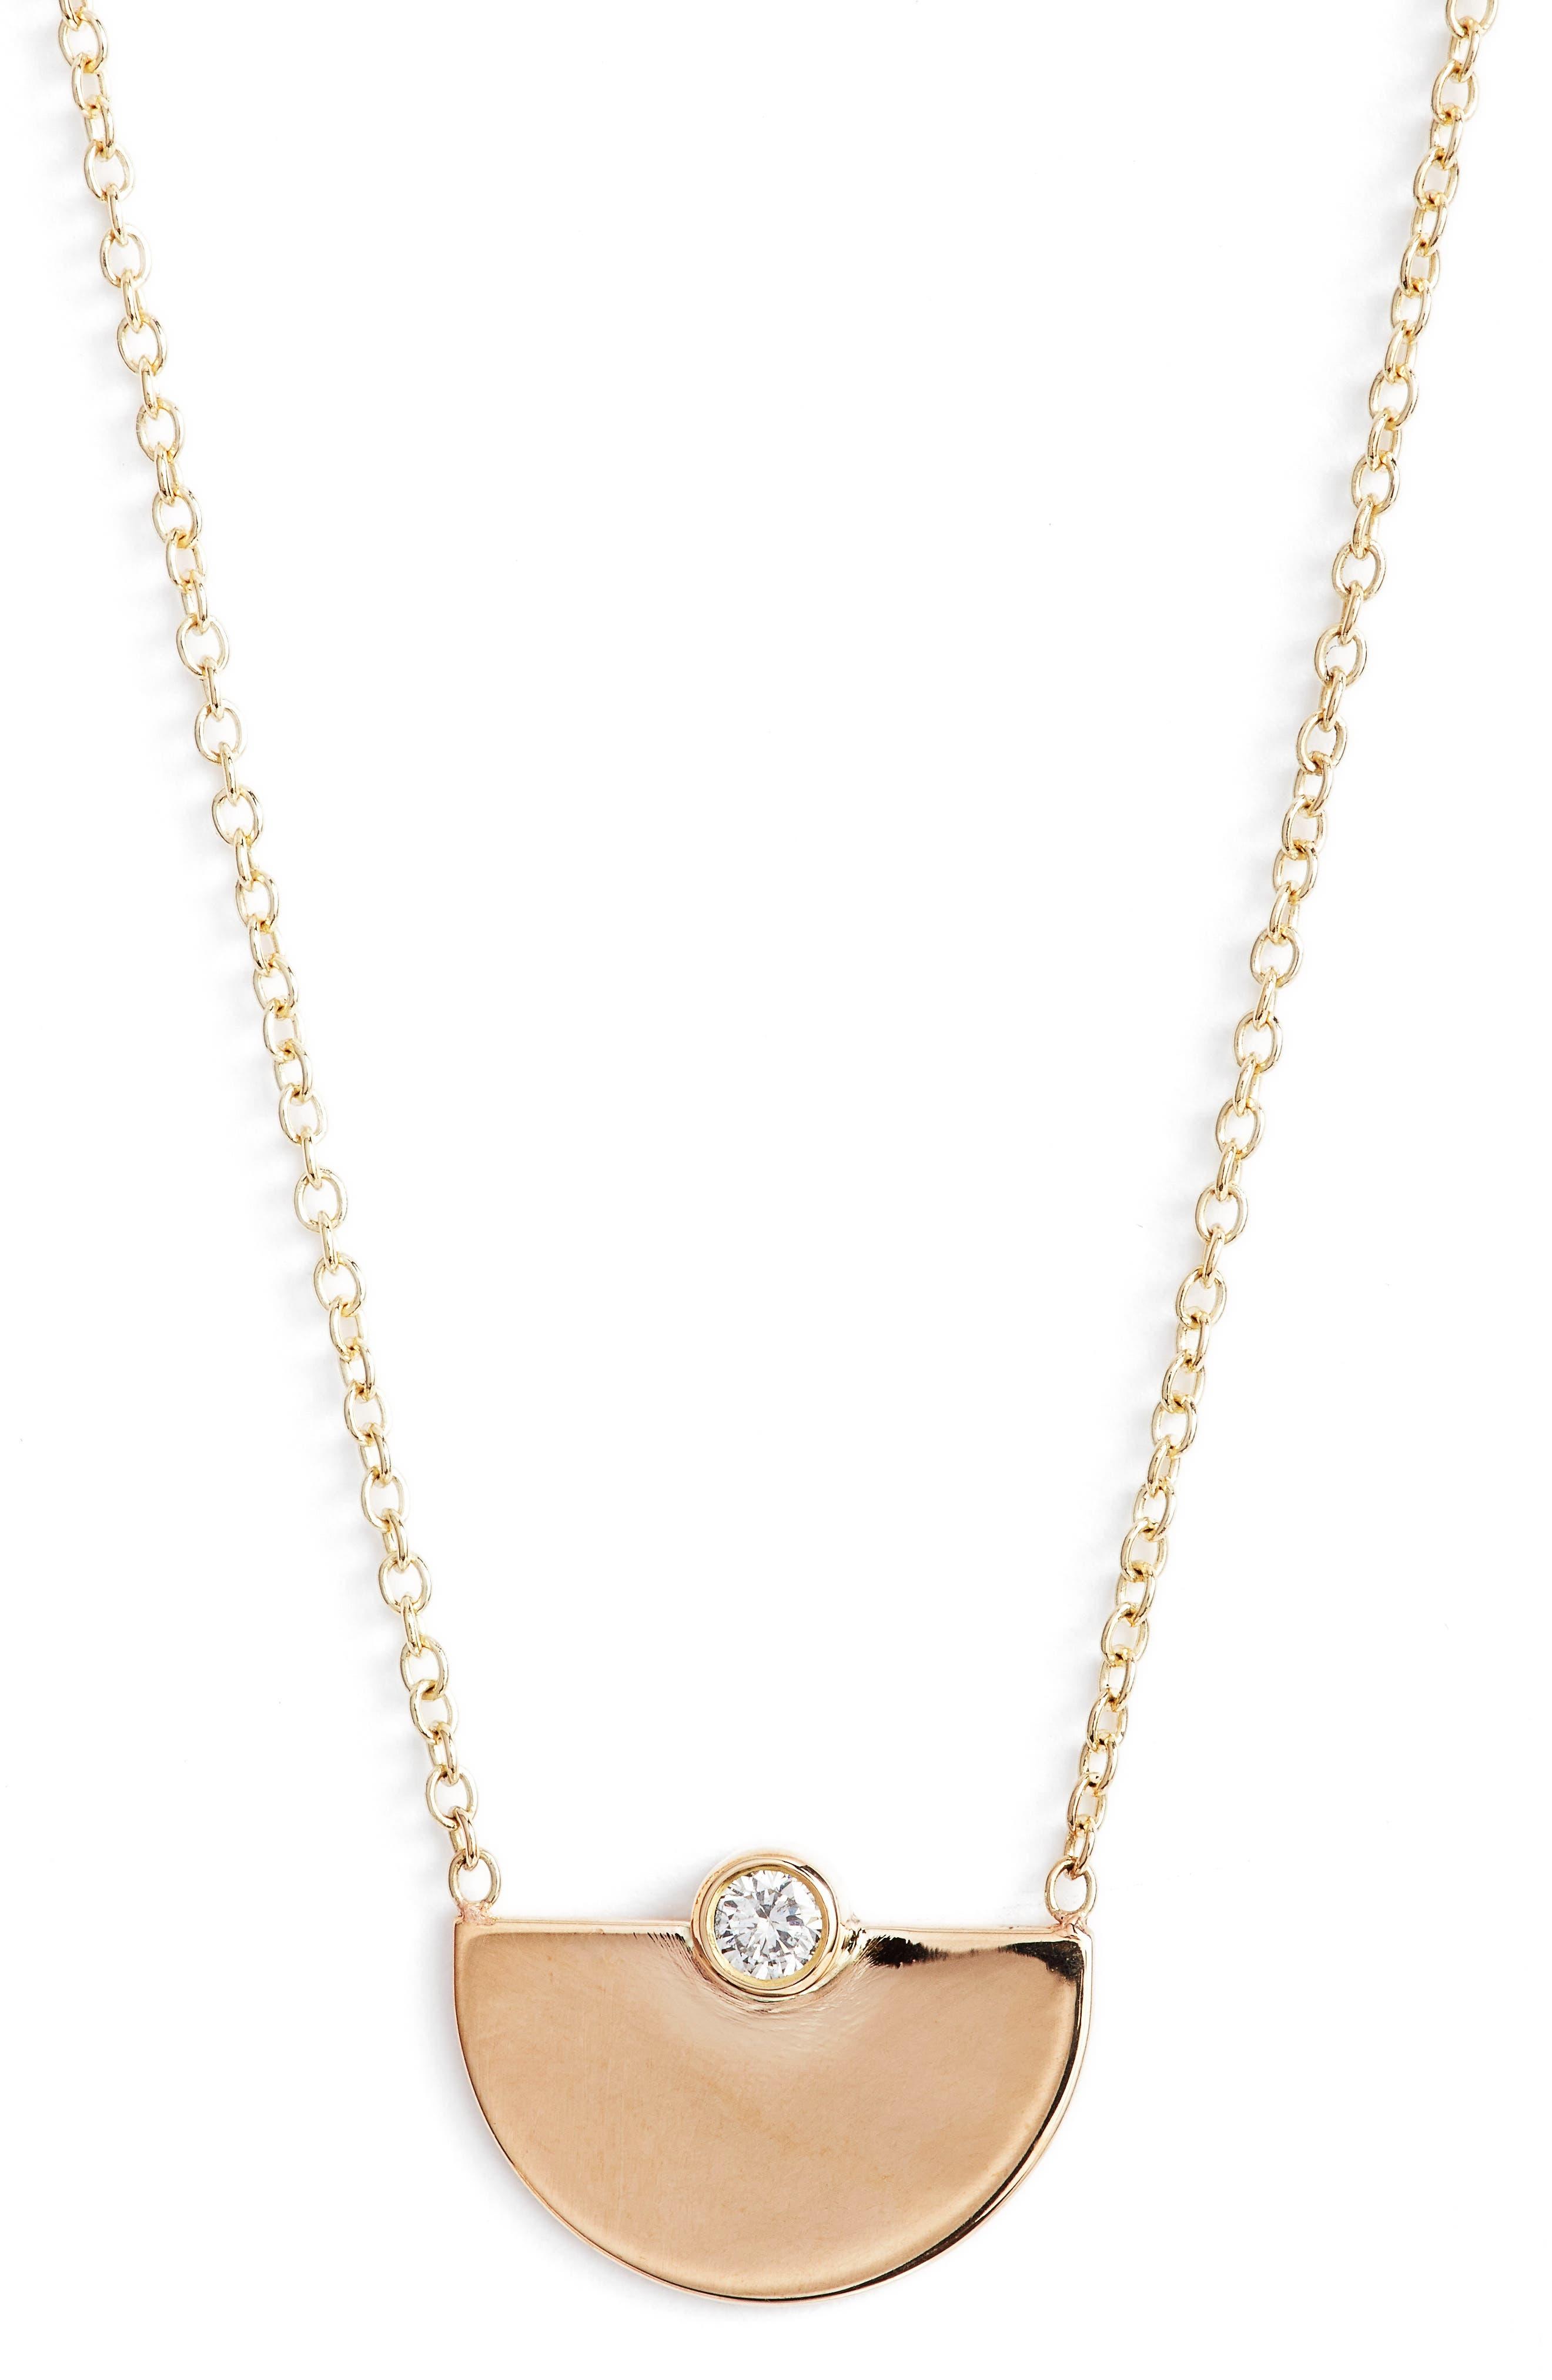 Horizon Diamond Pendant Necklace,                         Main,                         color, YELLOW GOLD